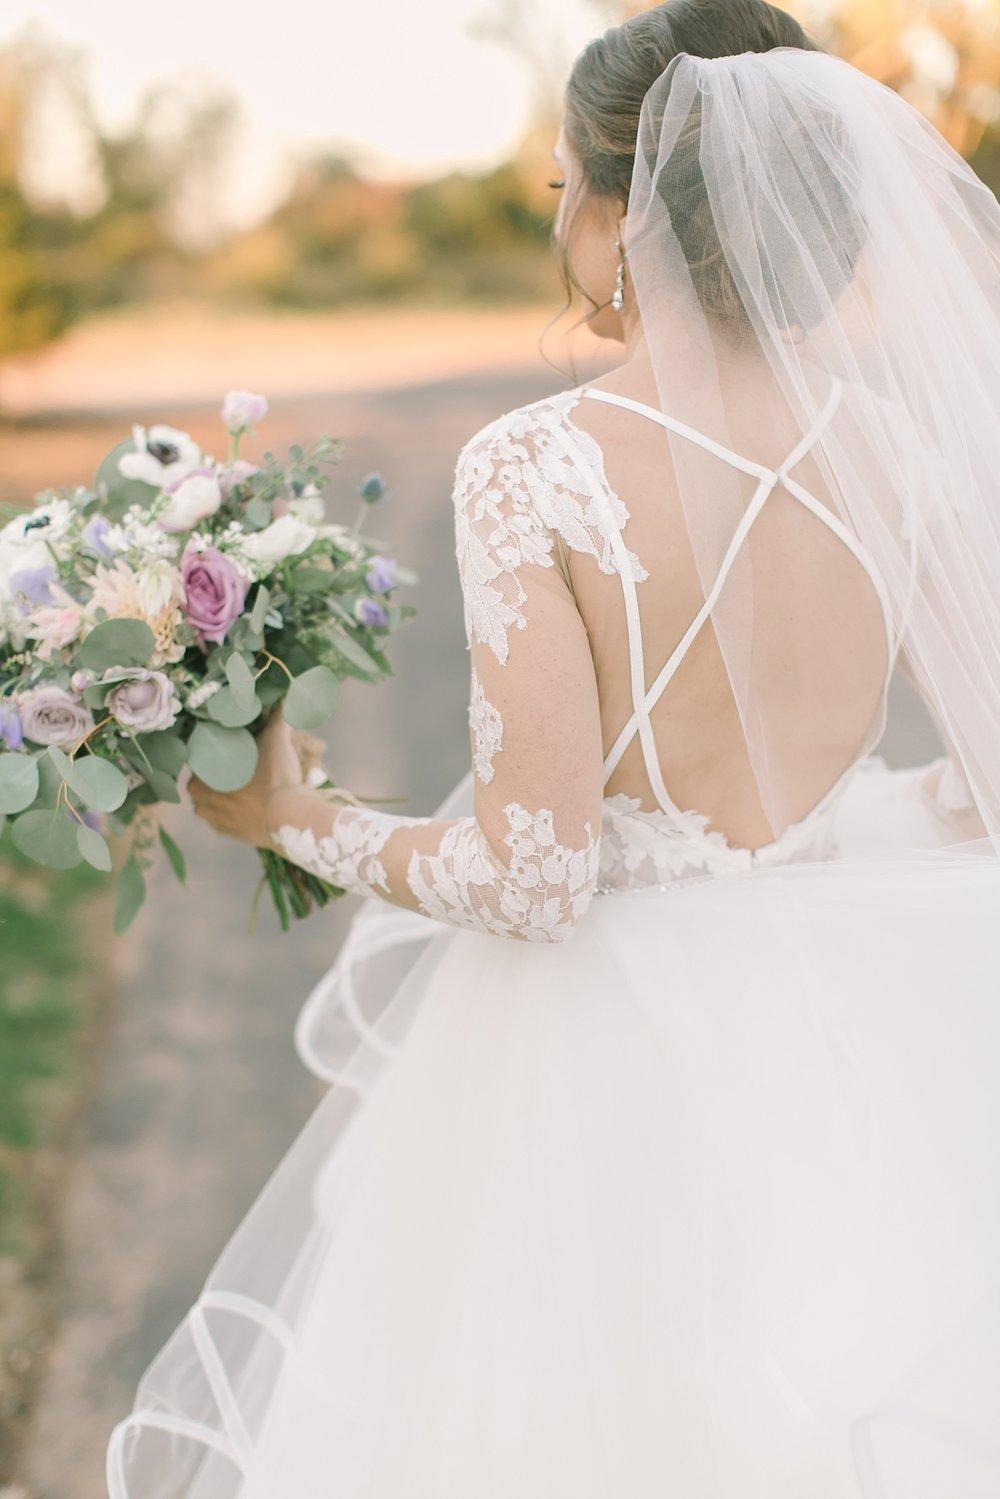 ryland_inn_nj_wedding_photography_0049.jpg